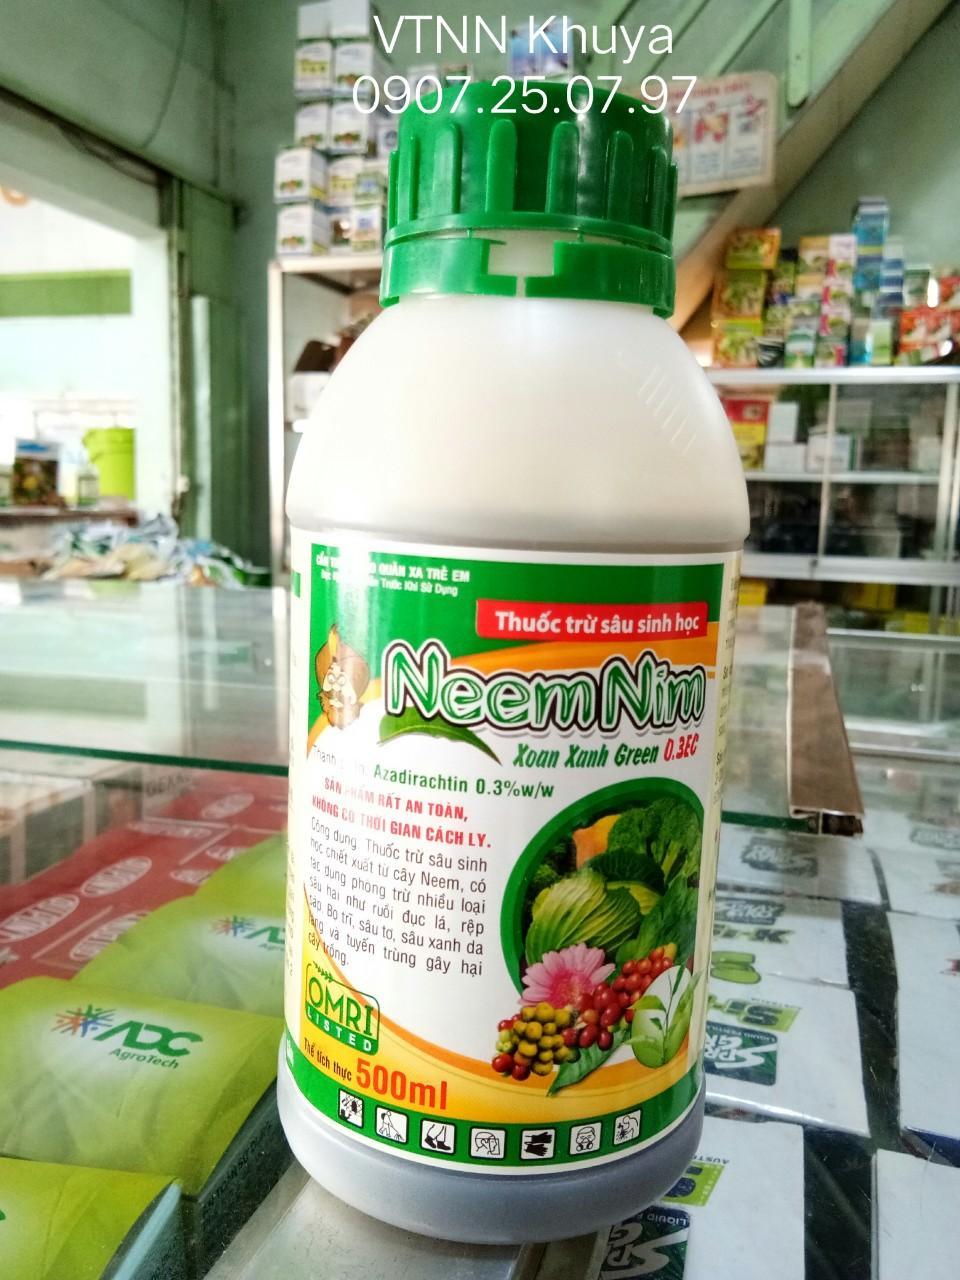 Thuốc trừ sâu sinh học NeemNim Green 0.3EC